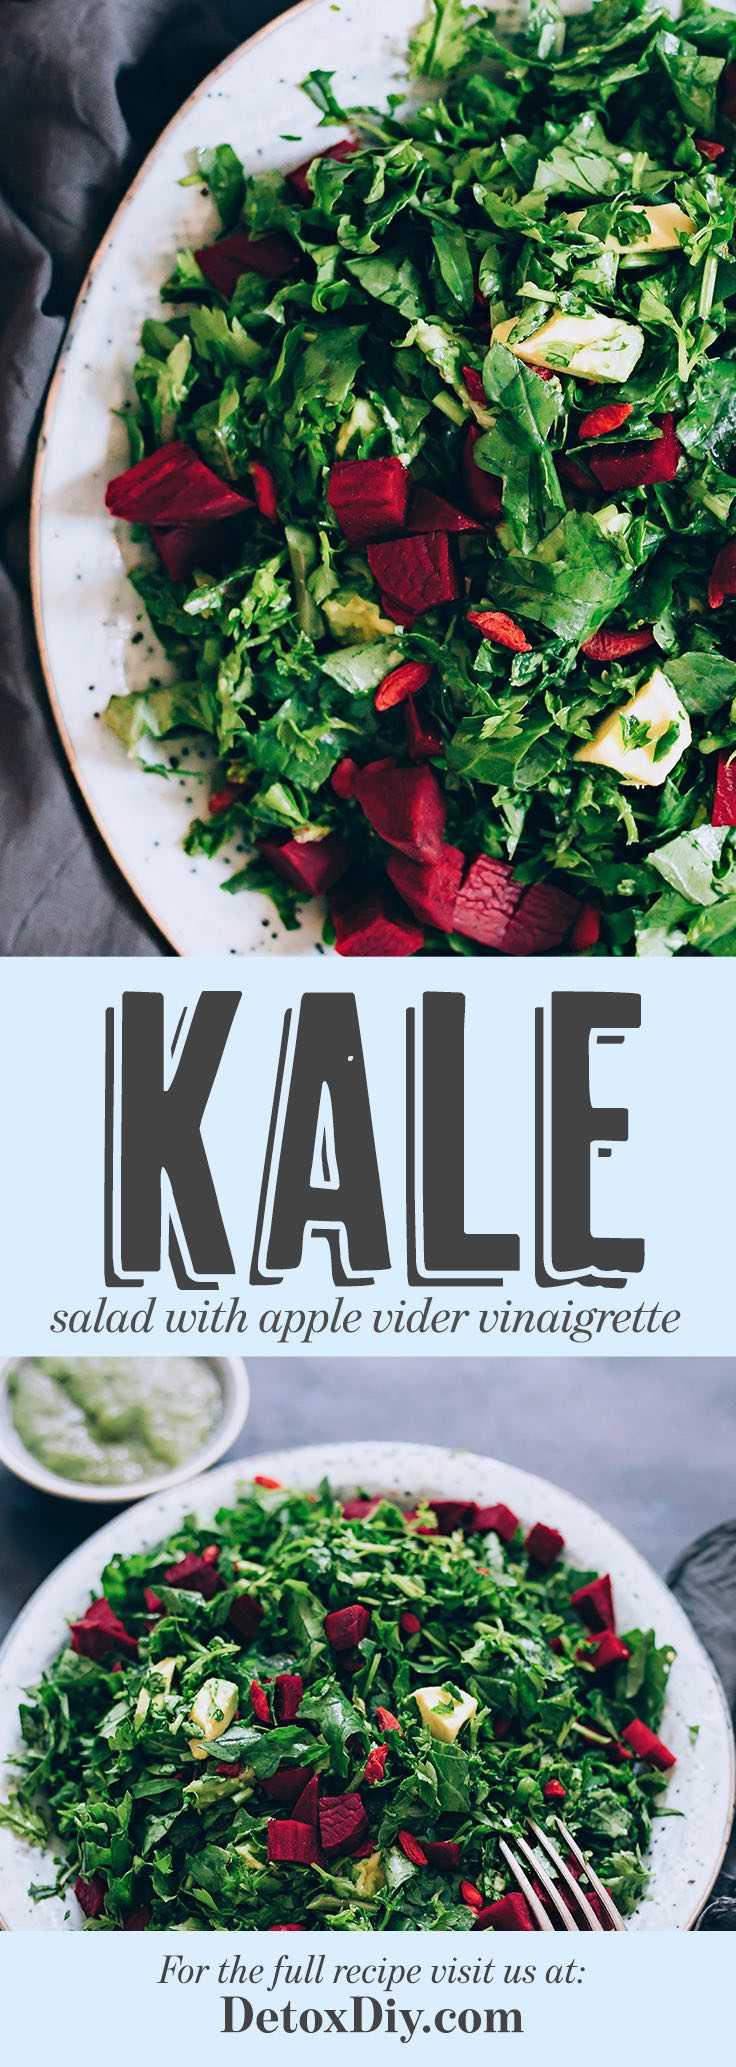 Beet, Avocado and Kale Salad with Apple Cider Vinaigrette